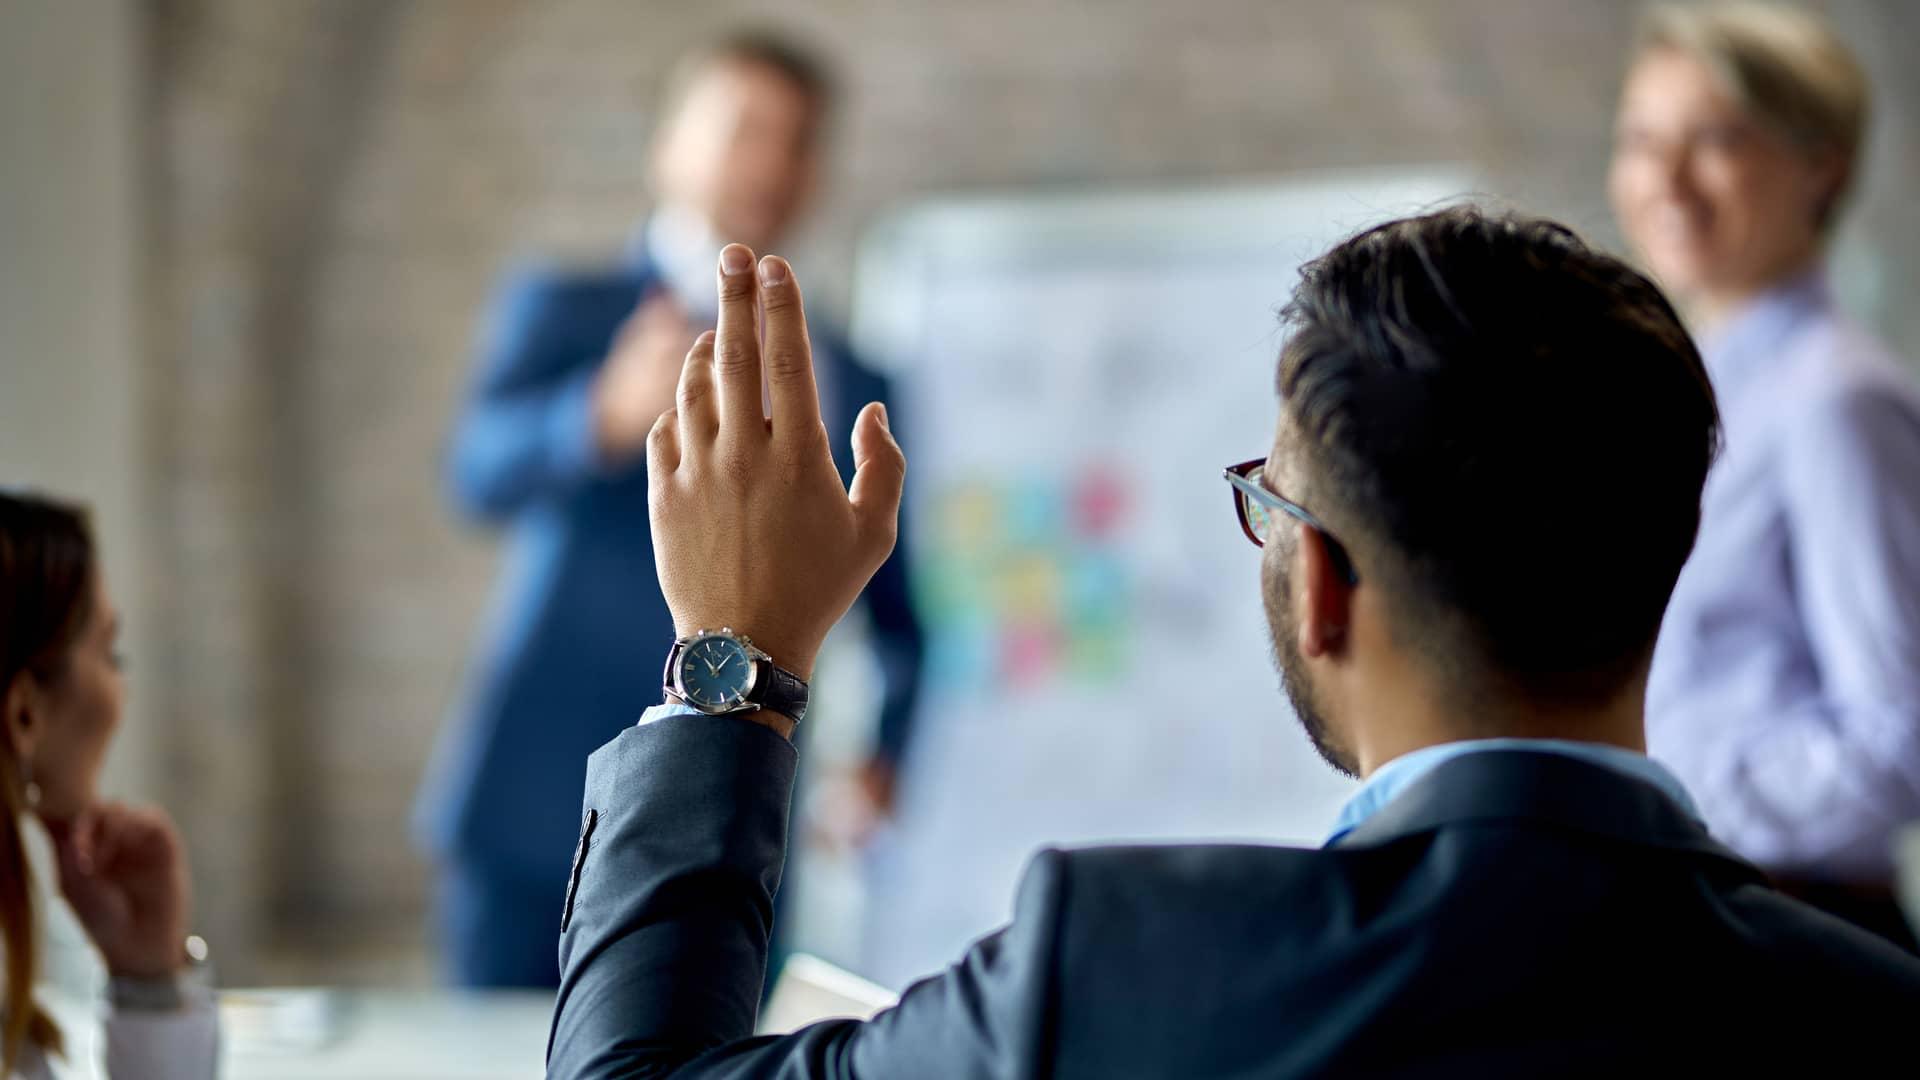 Hombre con mano levantada simboliza participativo